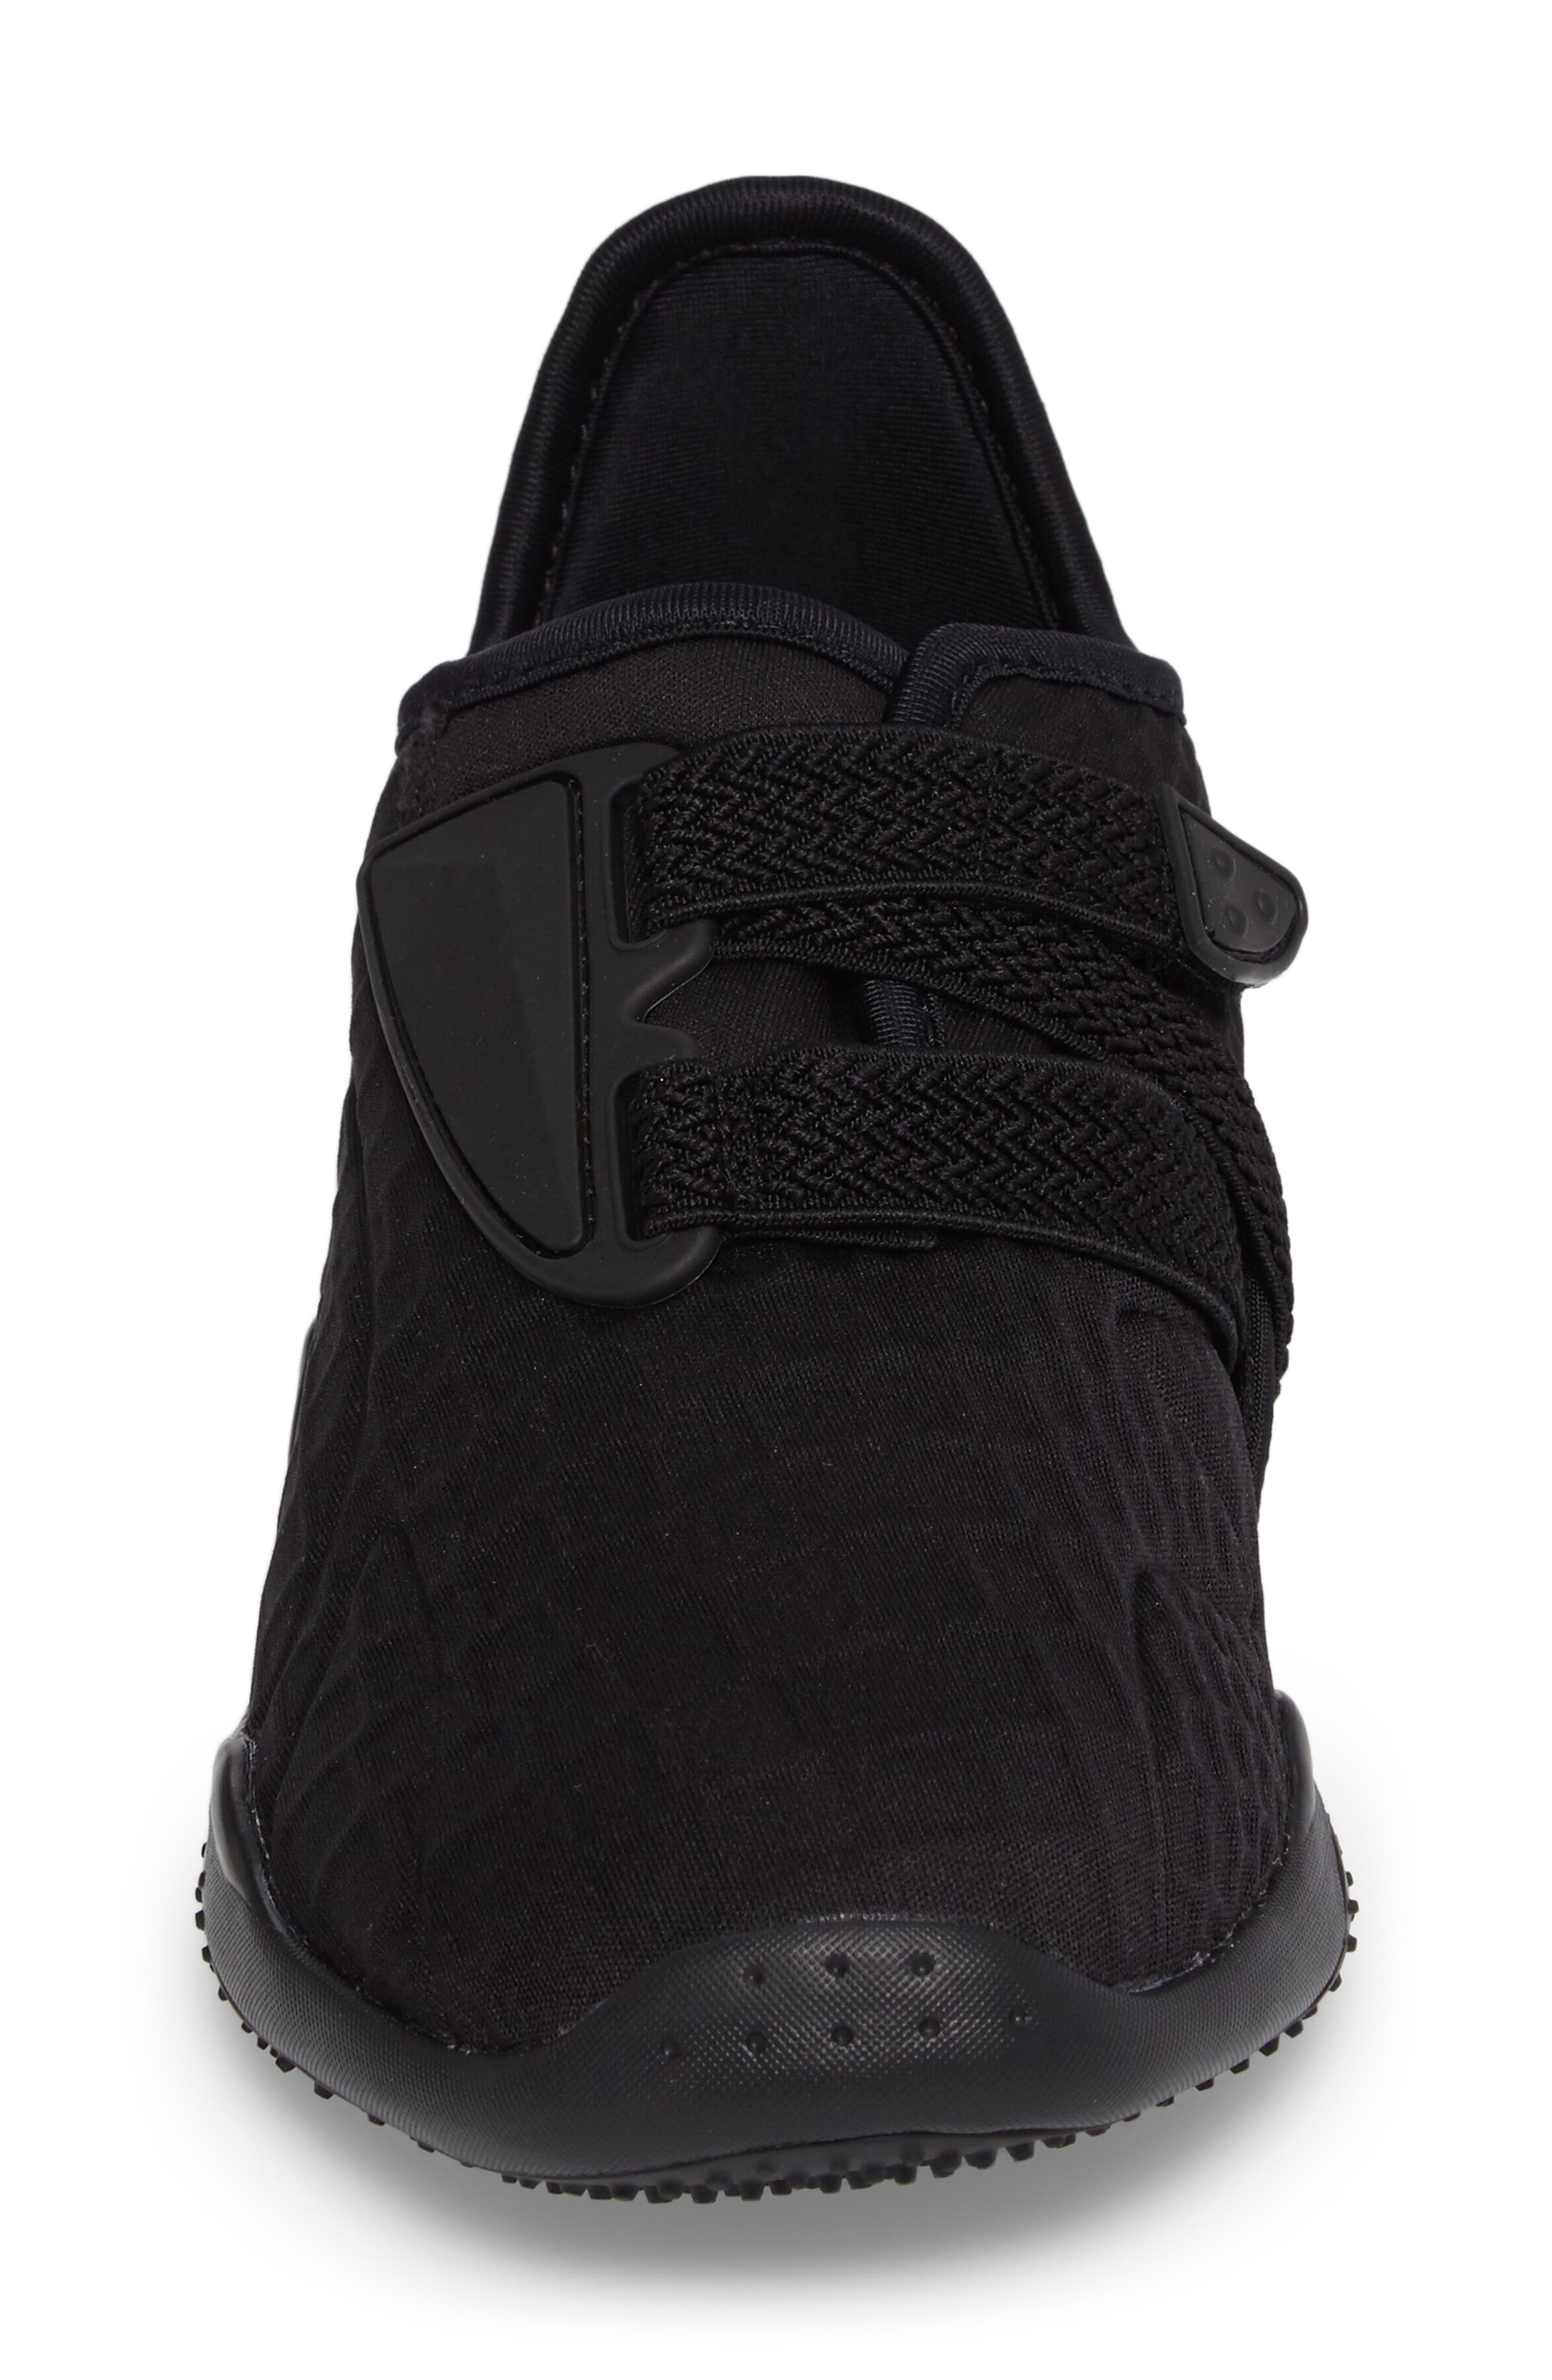 Mostro Fashion Sneaker,                             Alternate thumbnail 4, color,                             Puma Black/ Puma Black